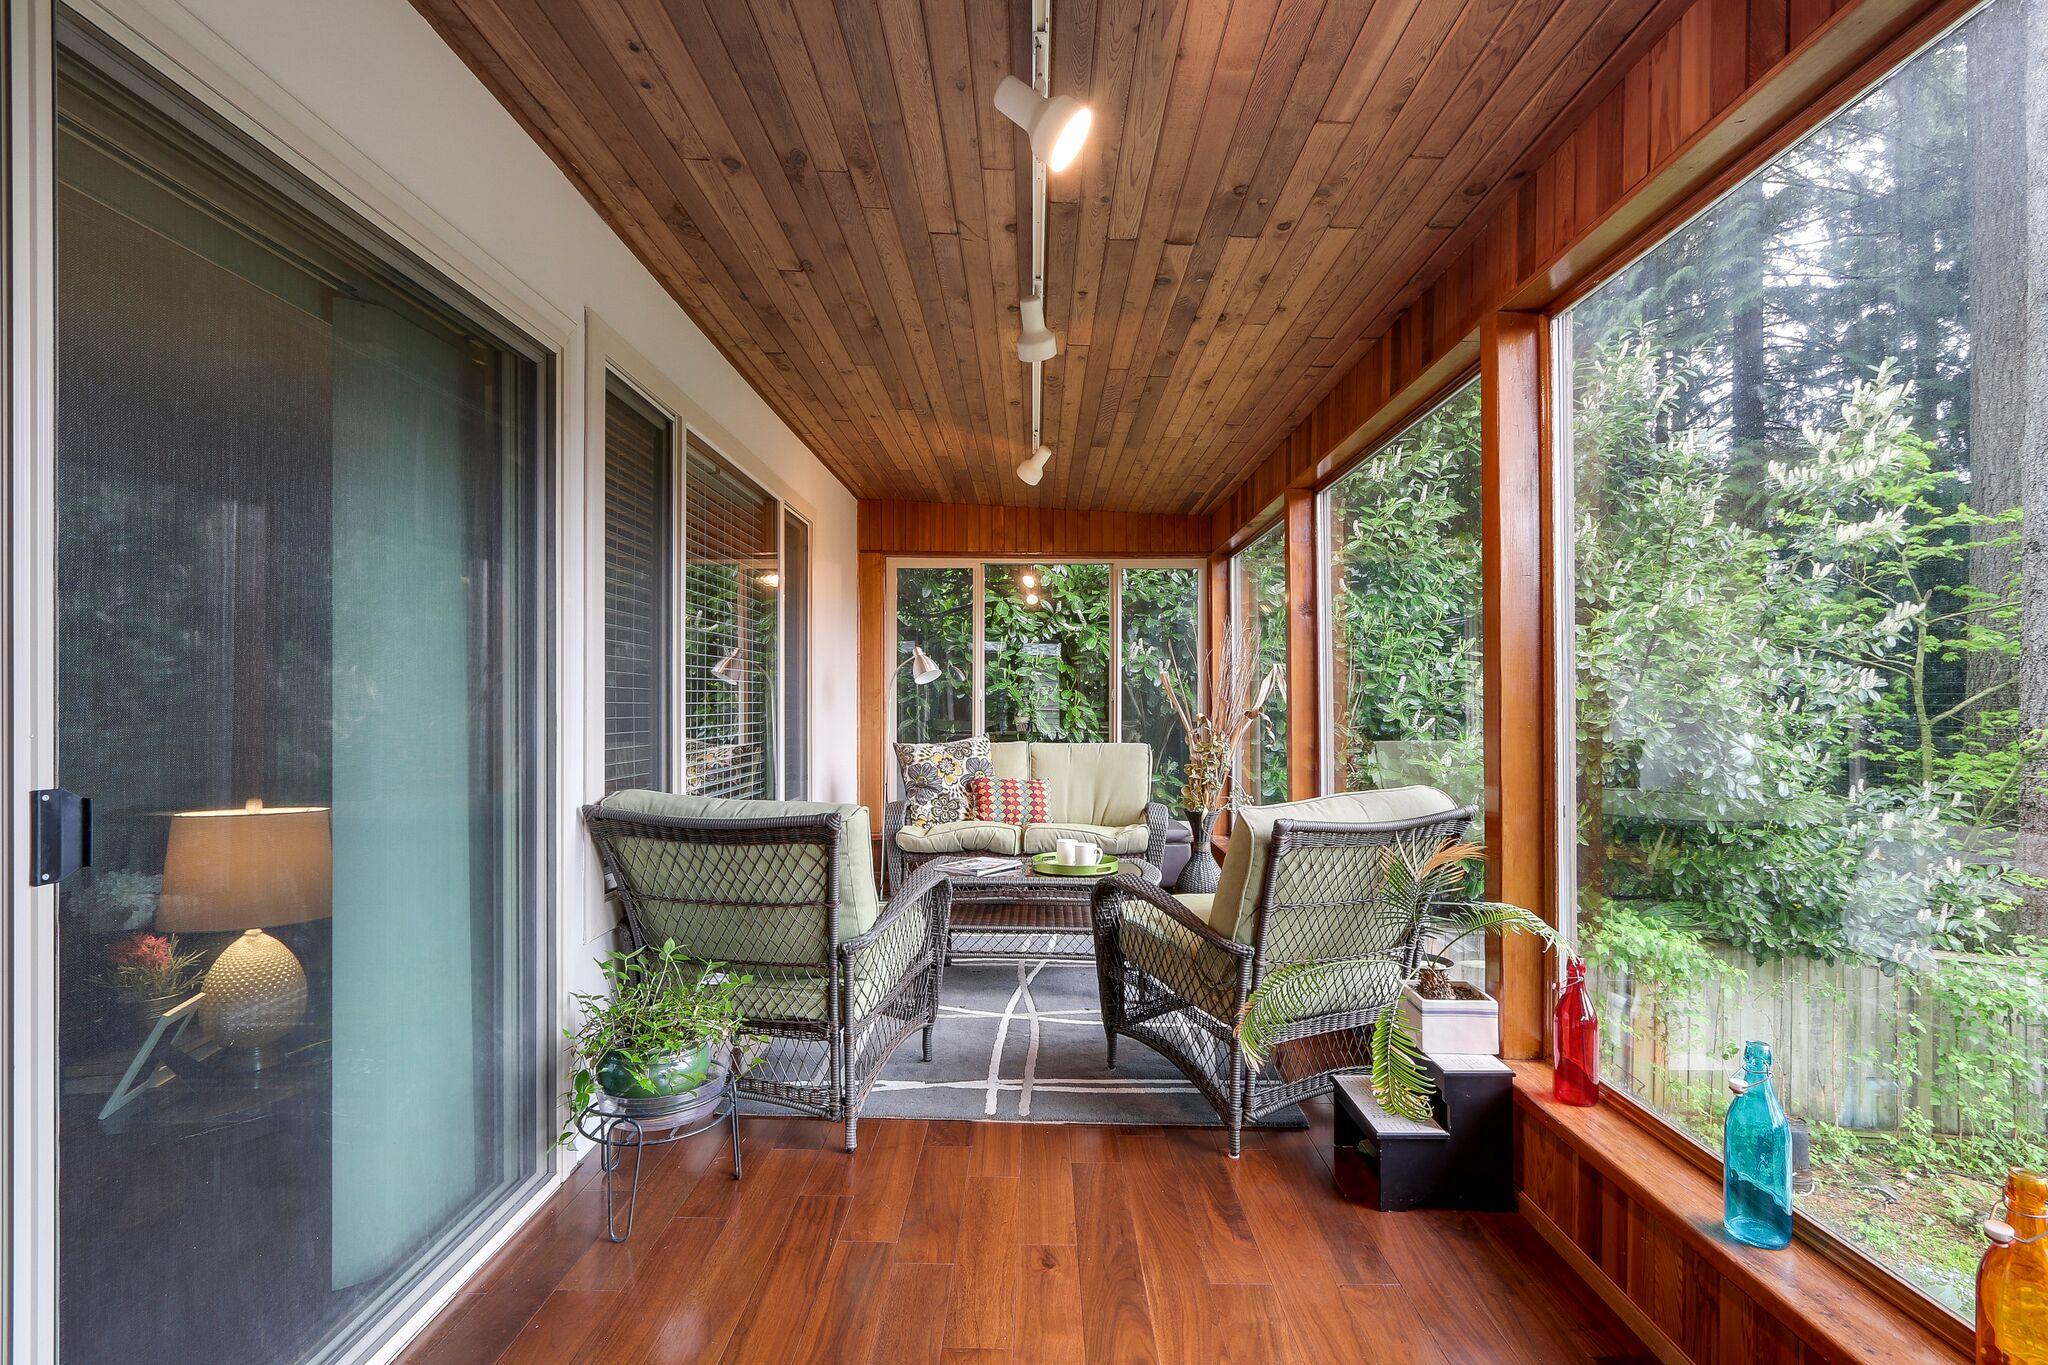 Luxury Sun Deck Renovation in Coquitlam